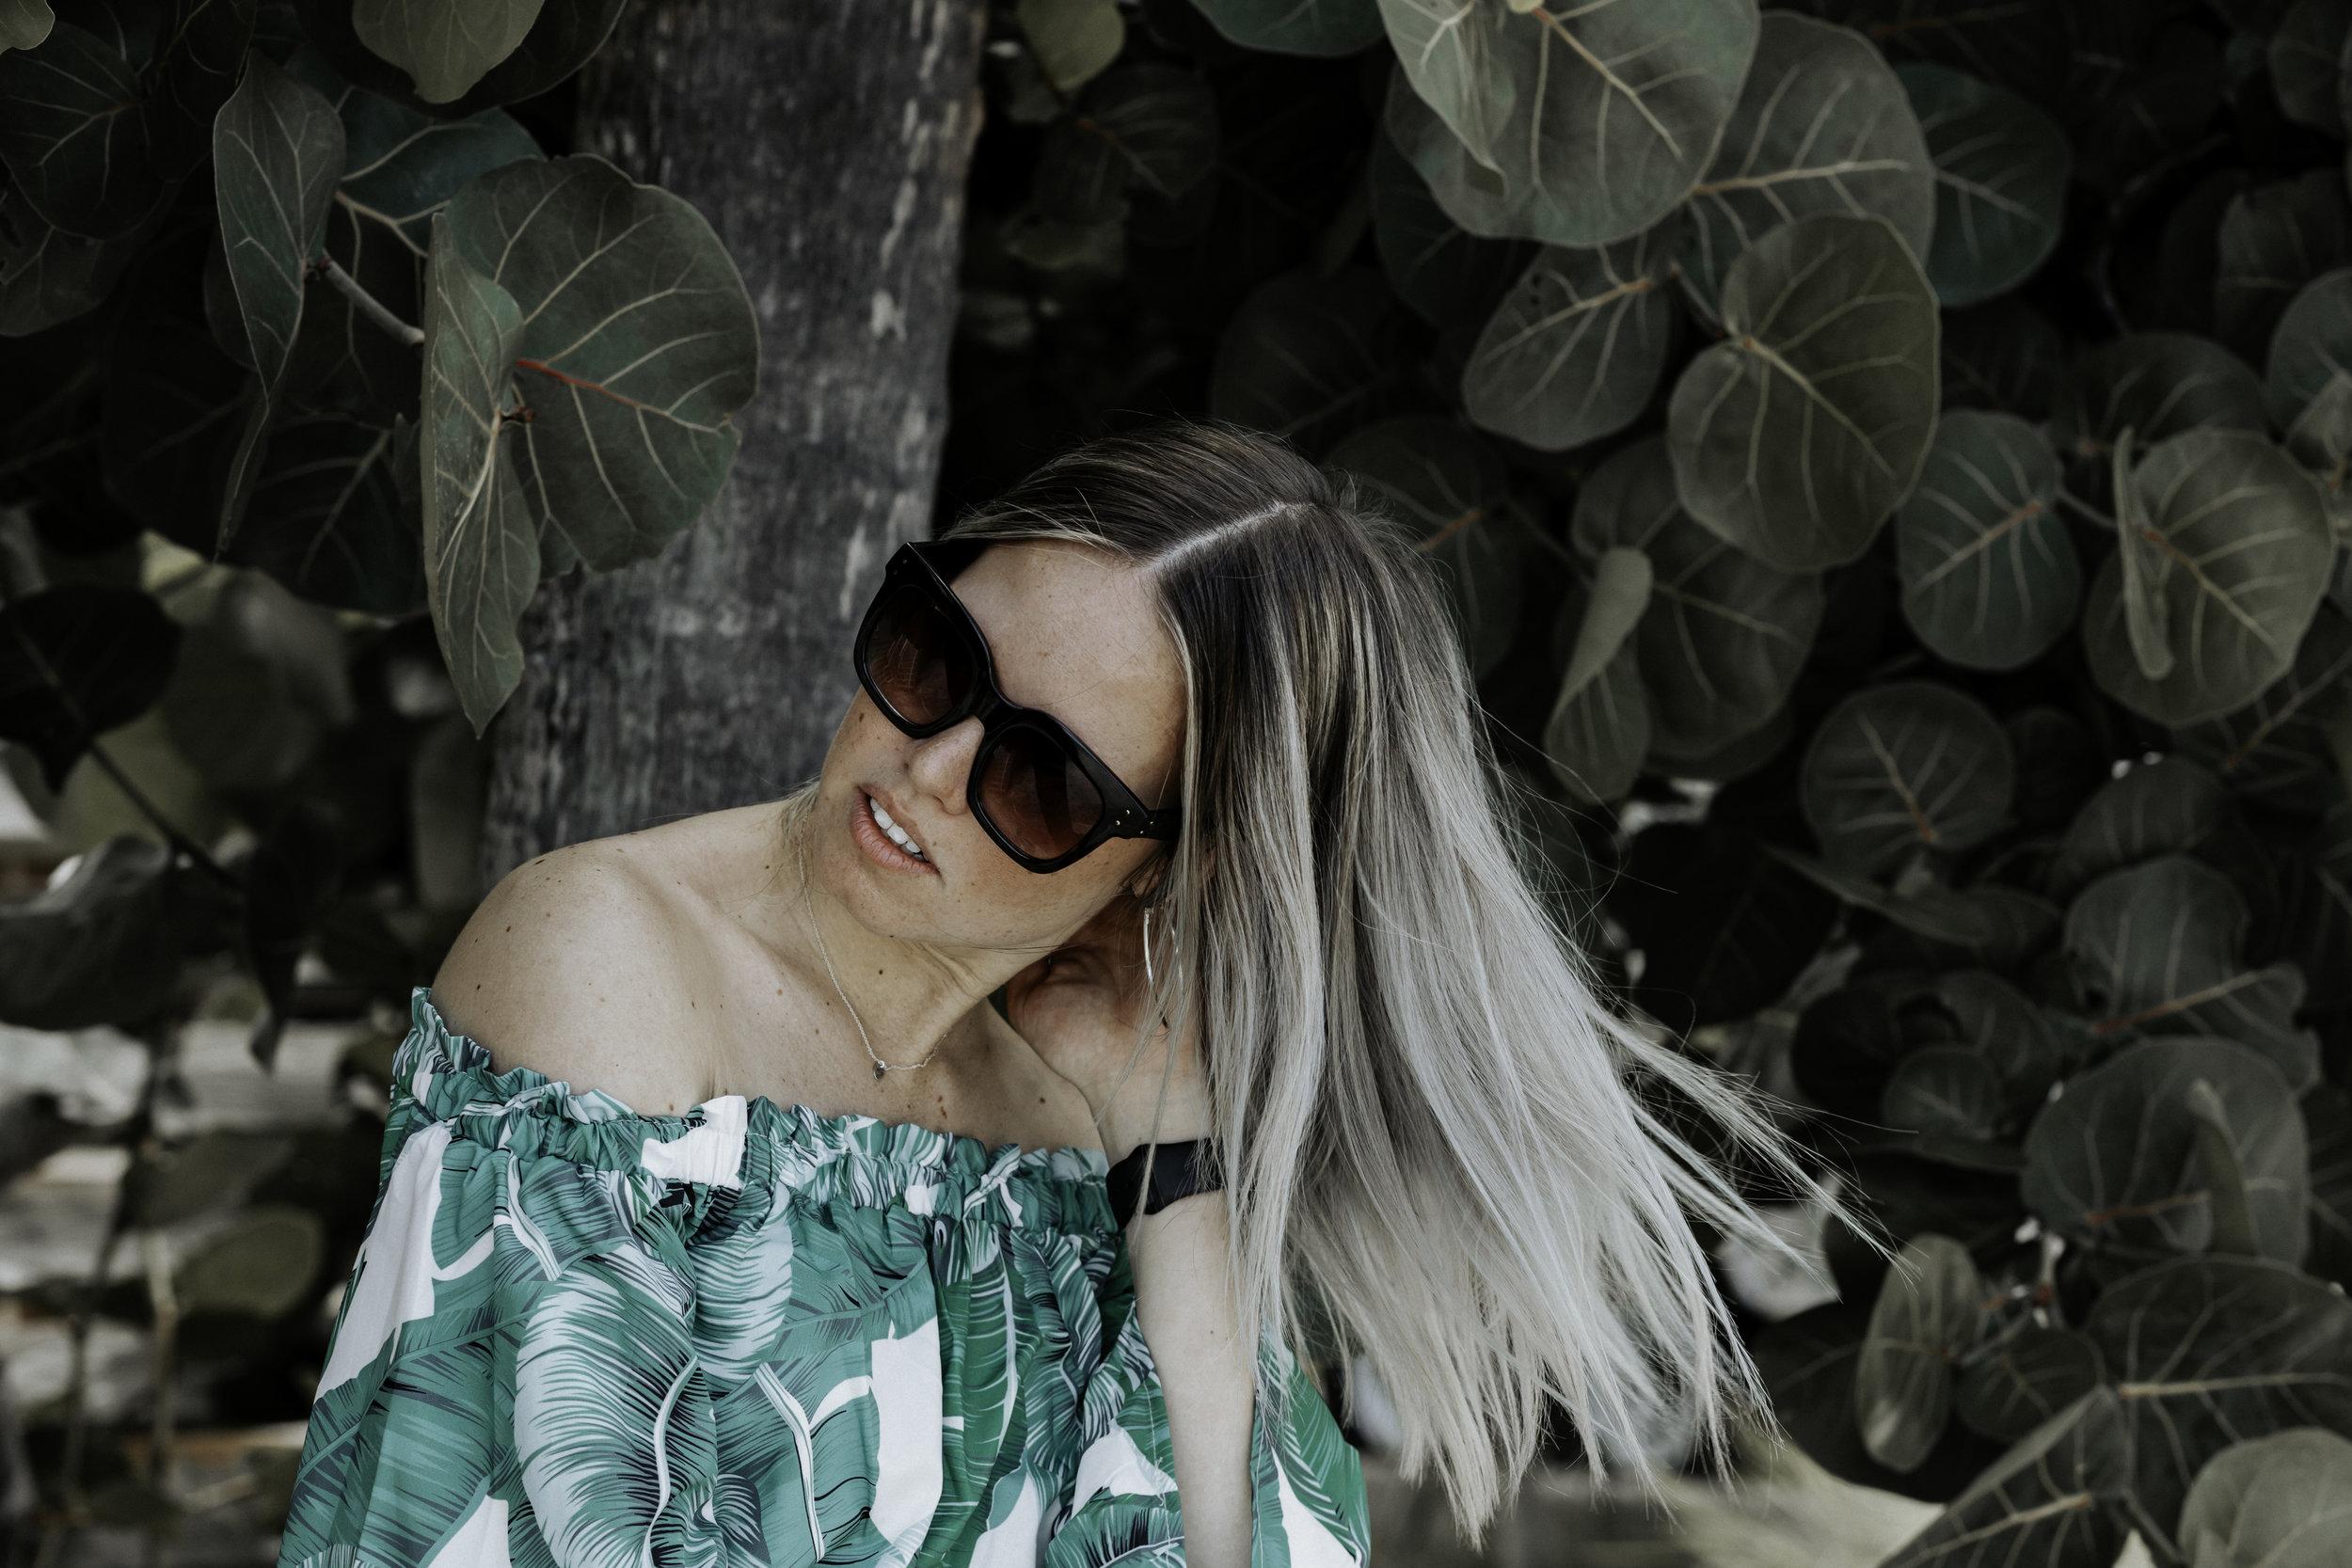 shadyveu-sunglasses-matte-black-ashlee-rose-photography-tiny-ashe-blog-sunglasses-florida-tampa-summer-banana-republic.jpg